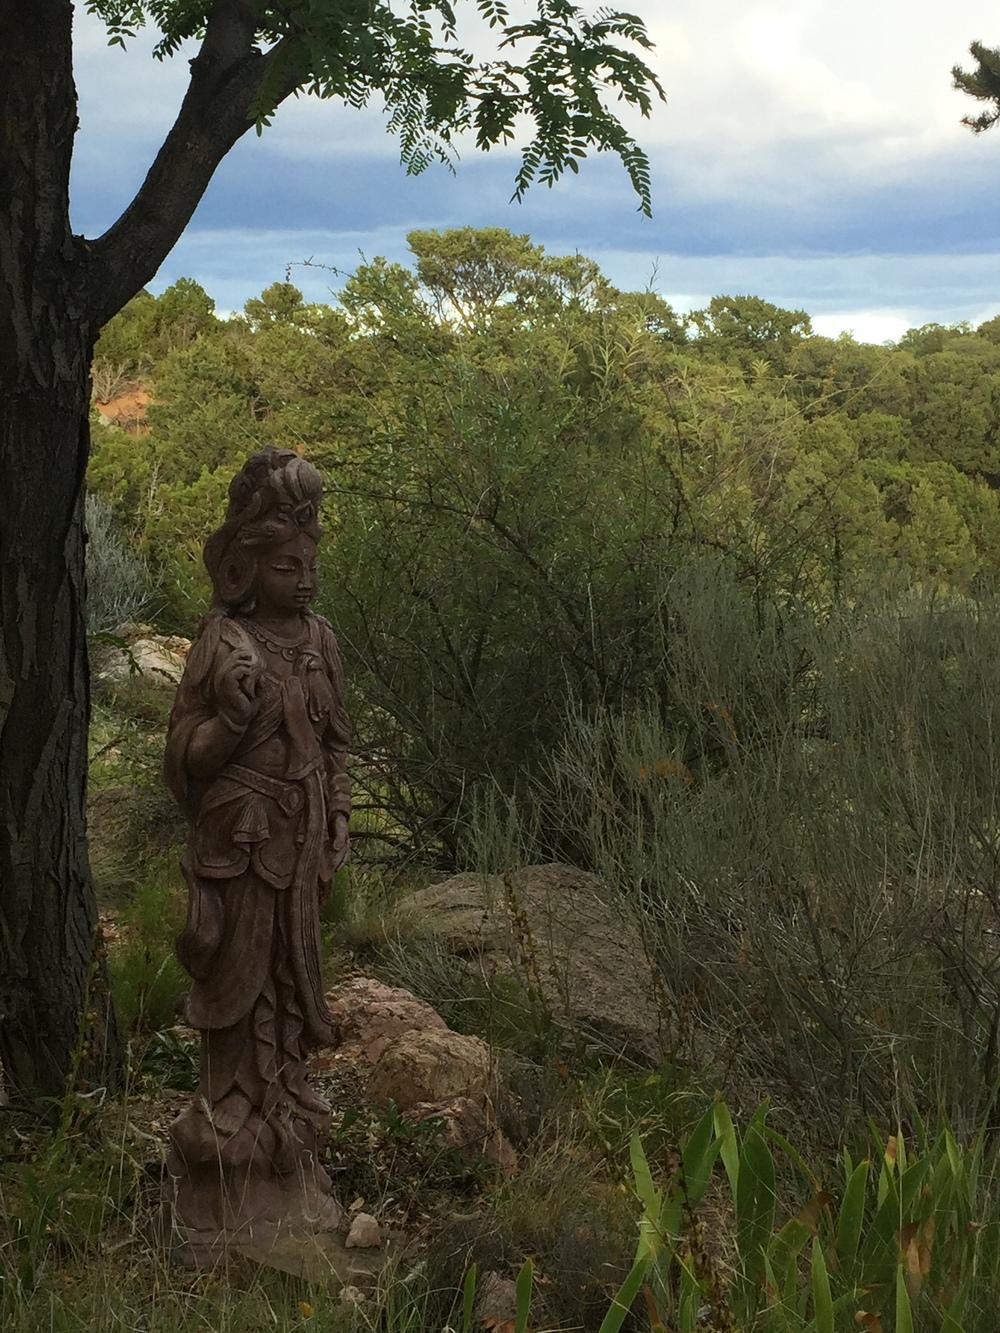 Kwan Yin - the bodhisattva of compassion